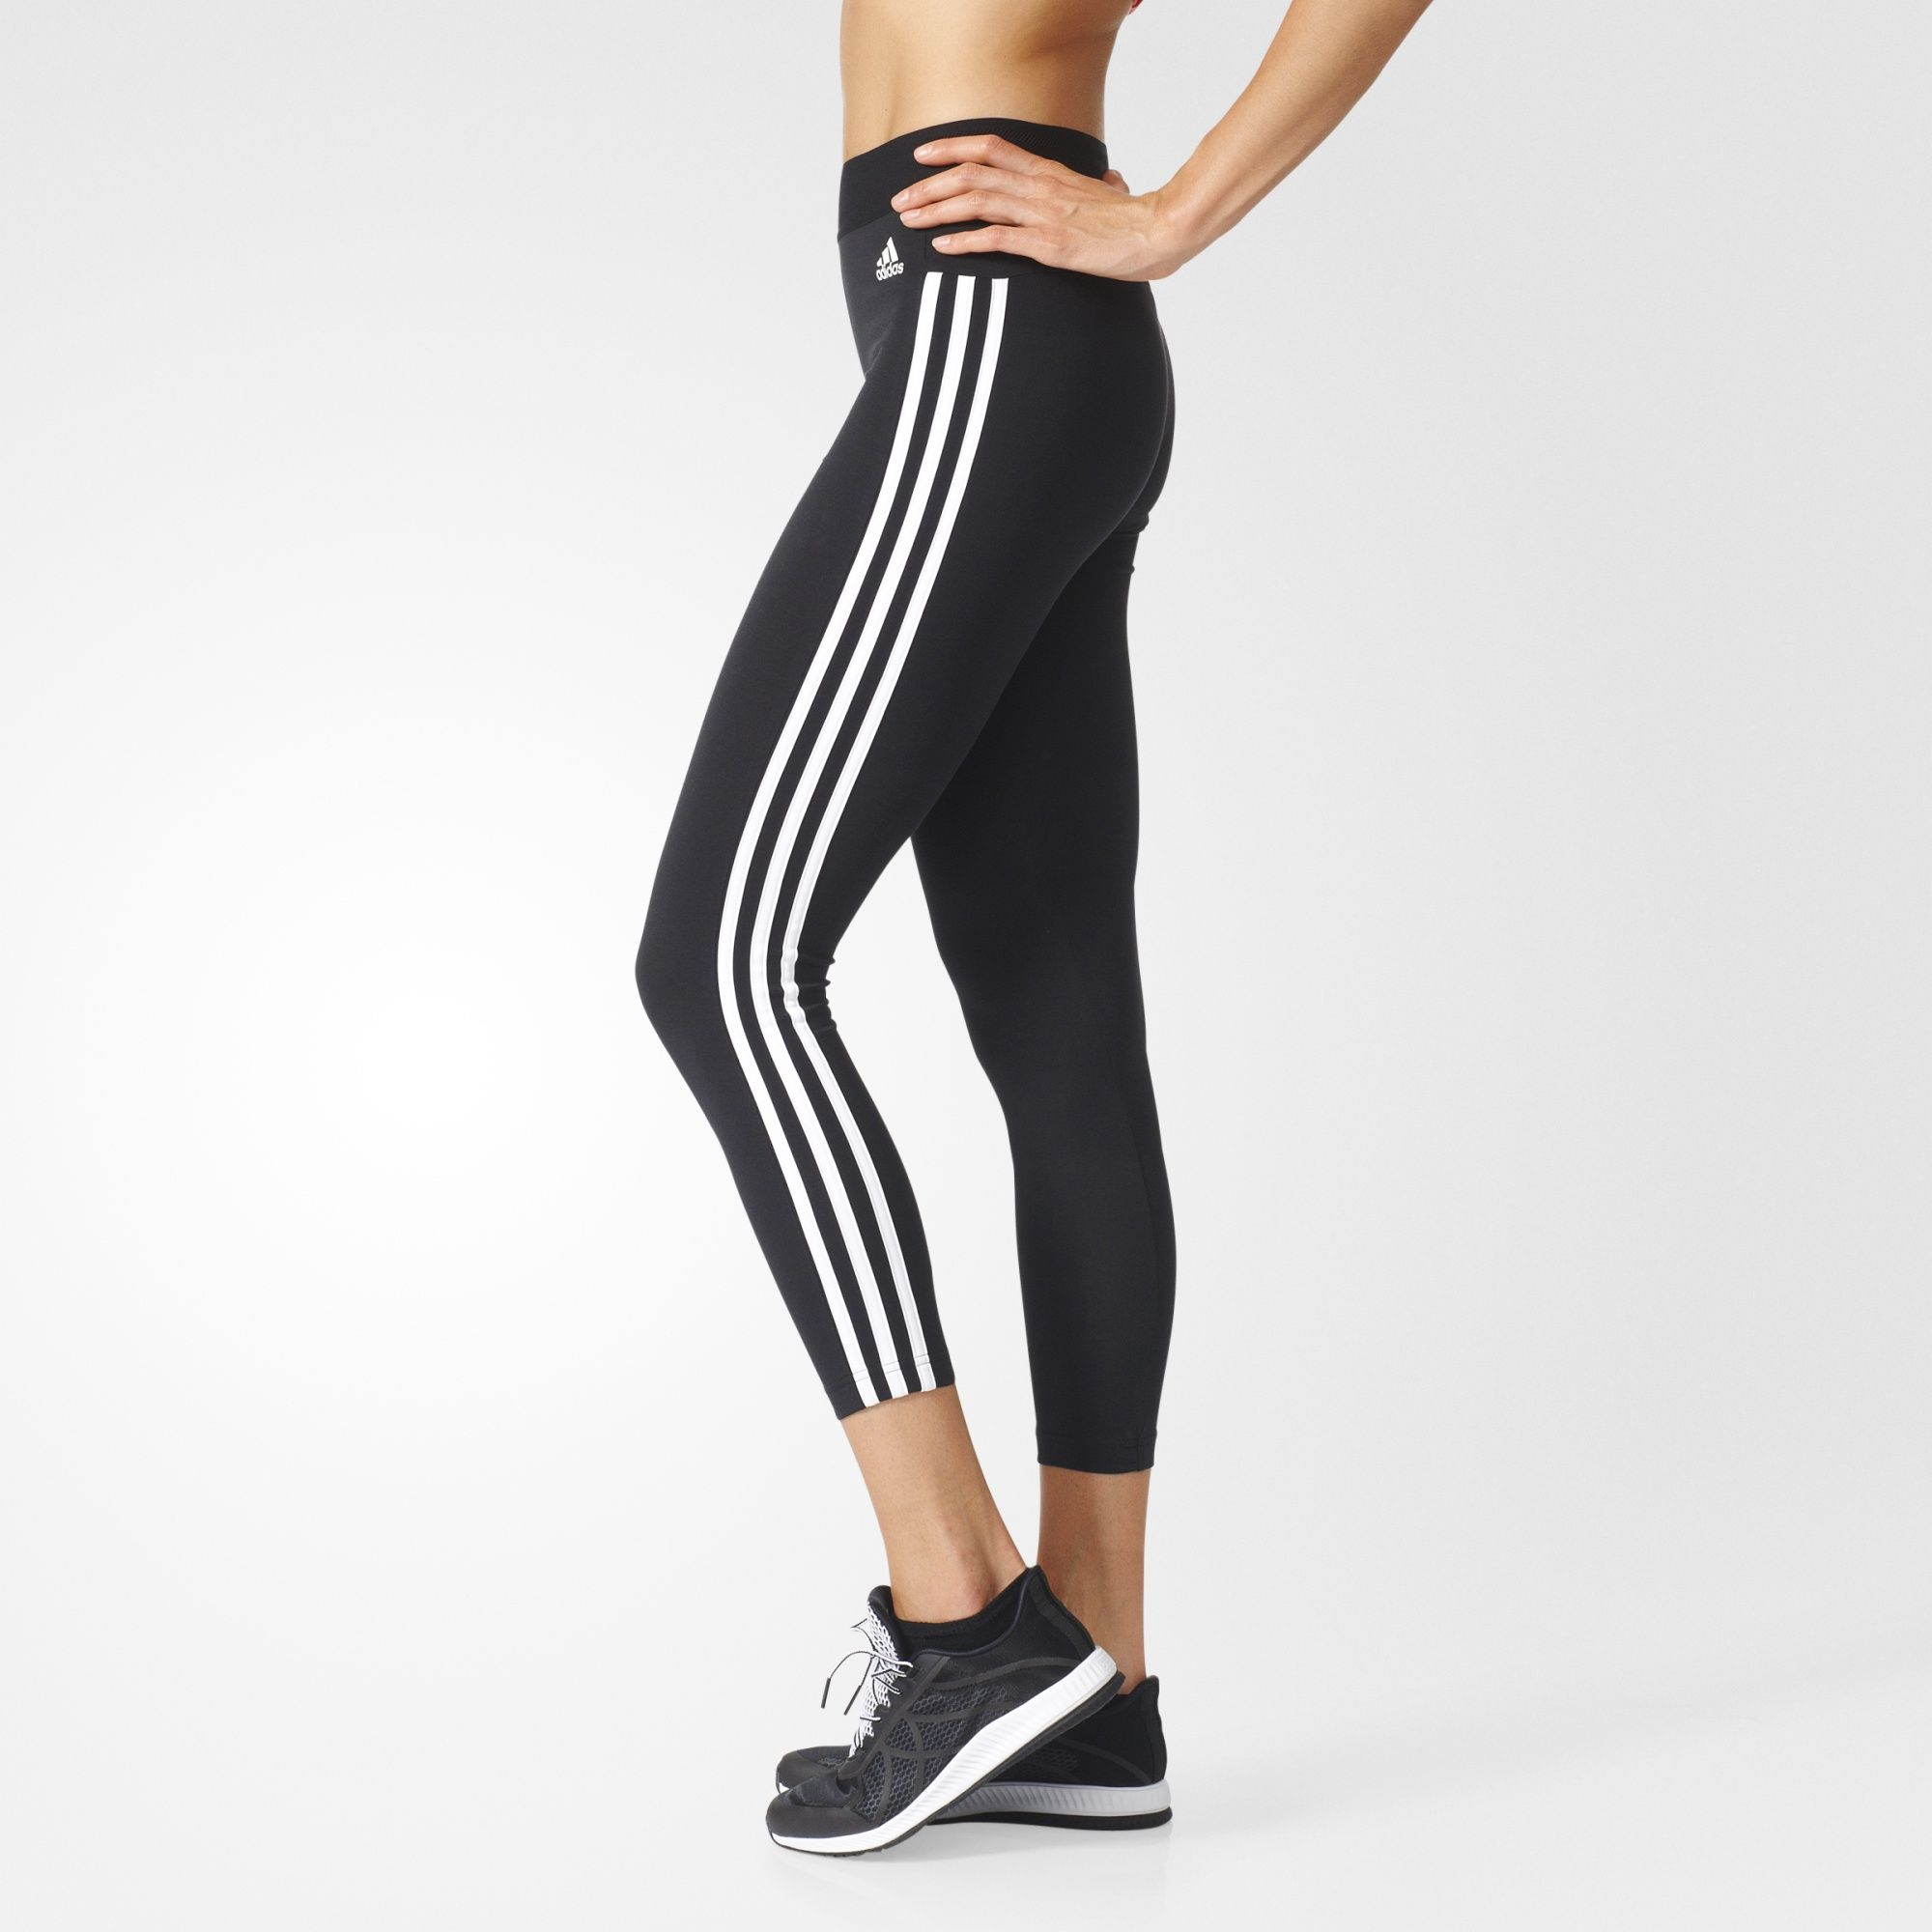 Adidas Essentials 3 Stripes Tights Tights.no